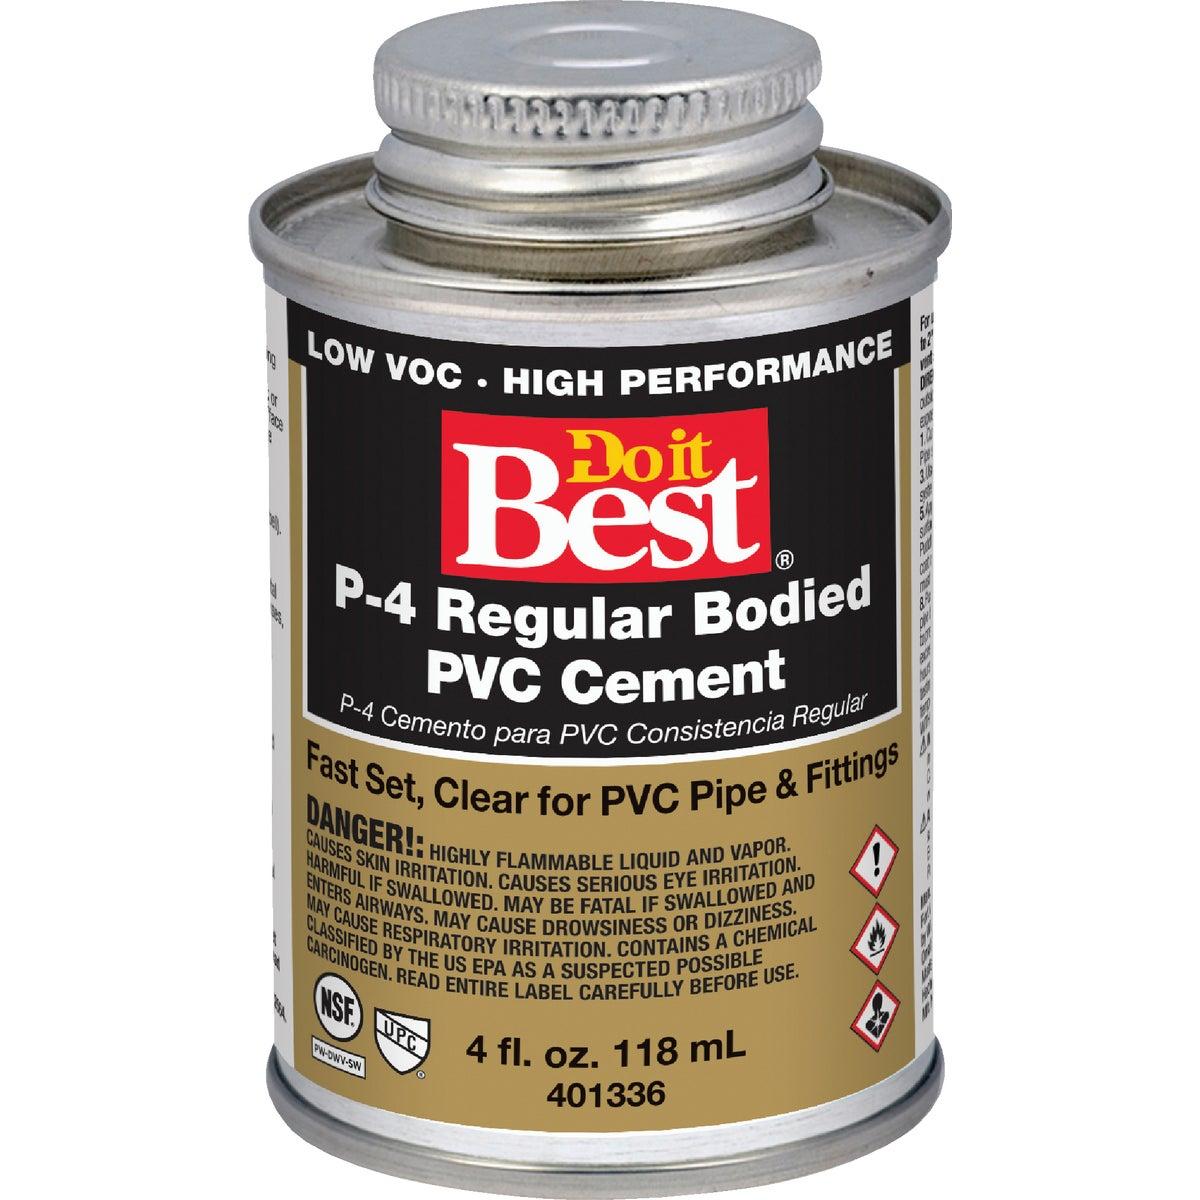 1/4 PINT PVC CEMENT